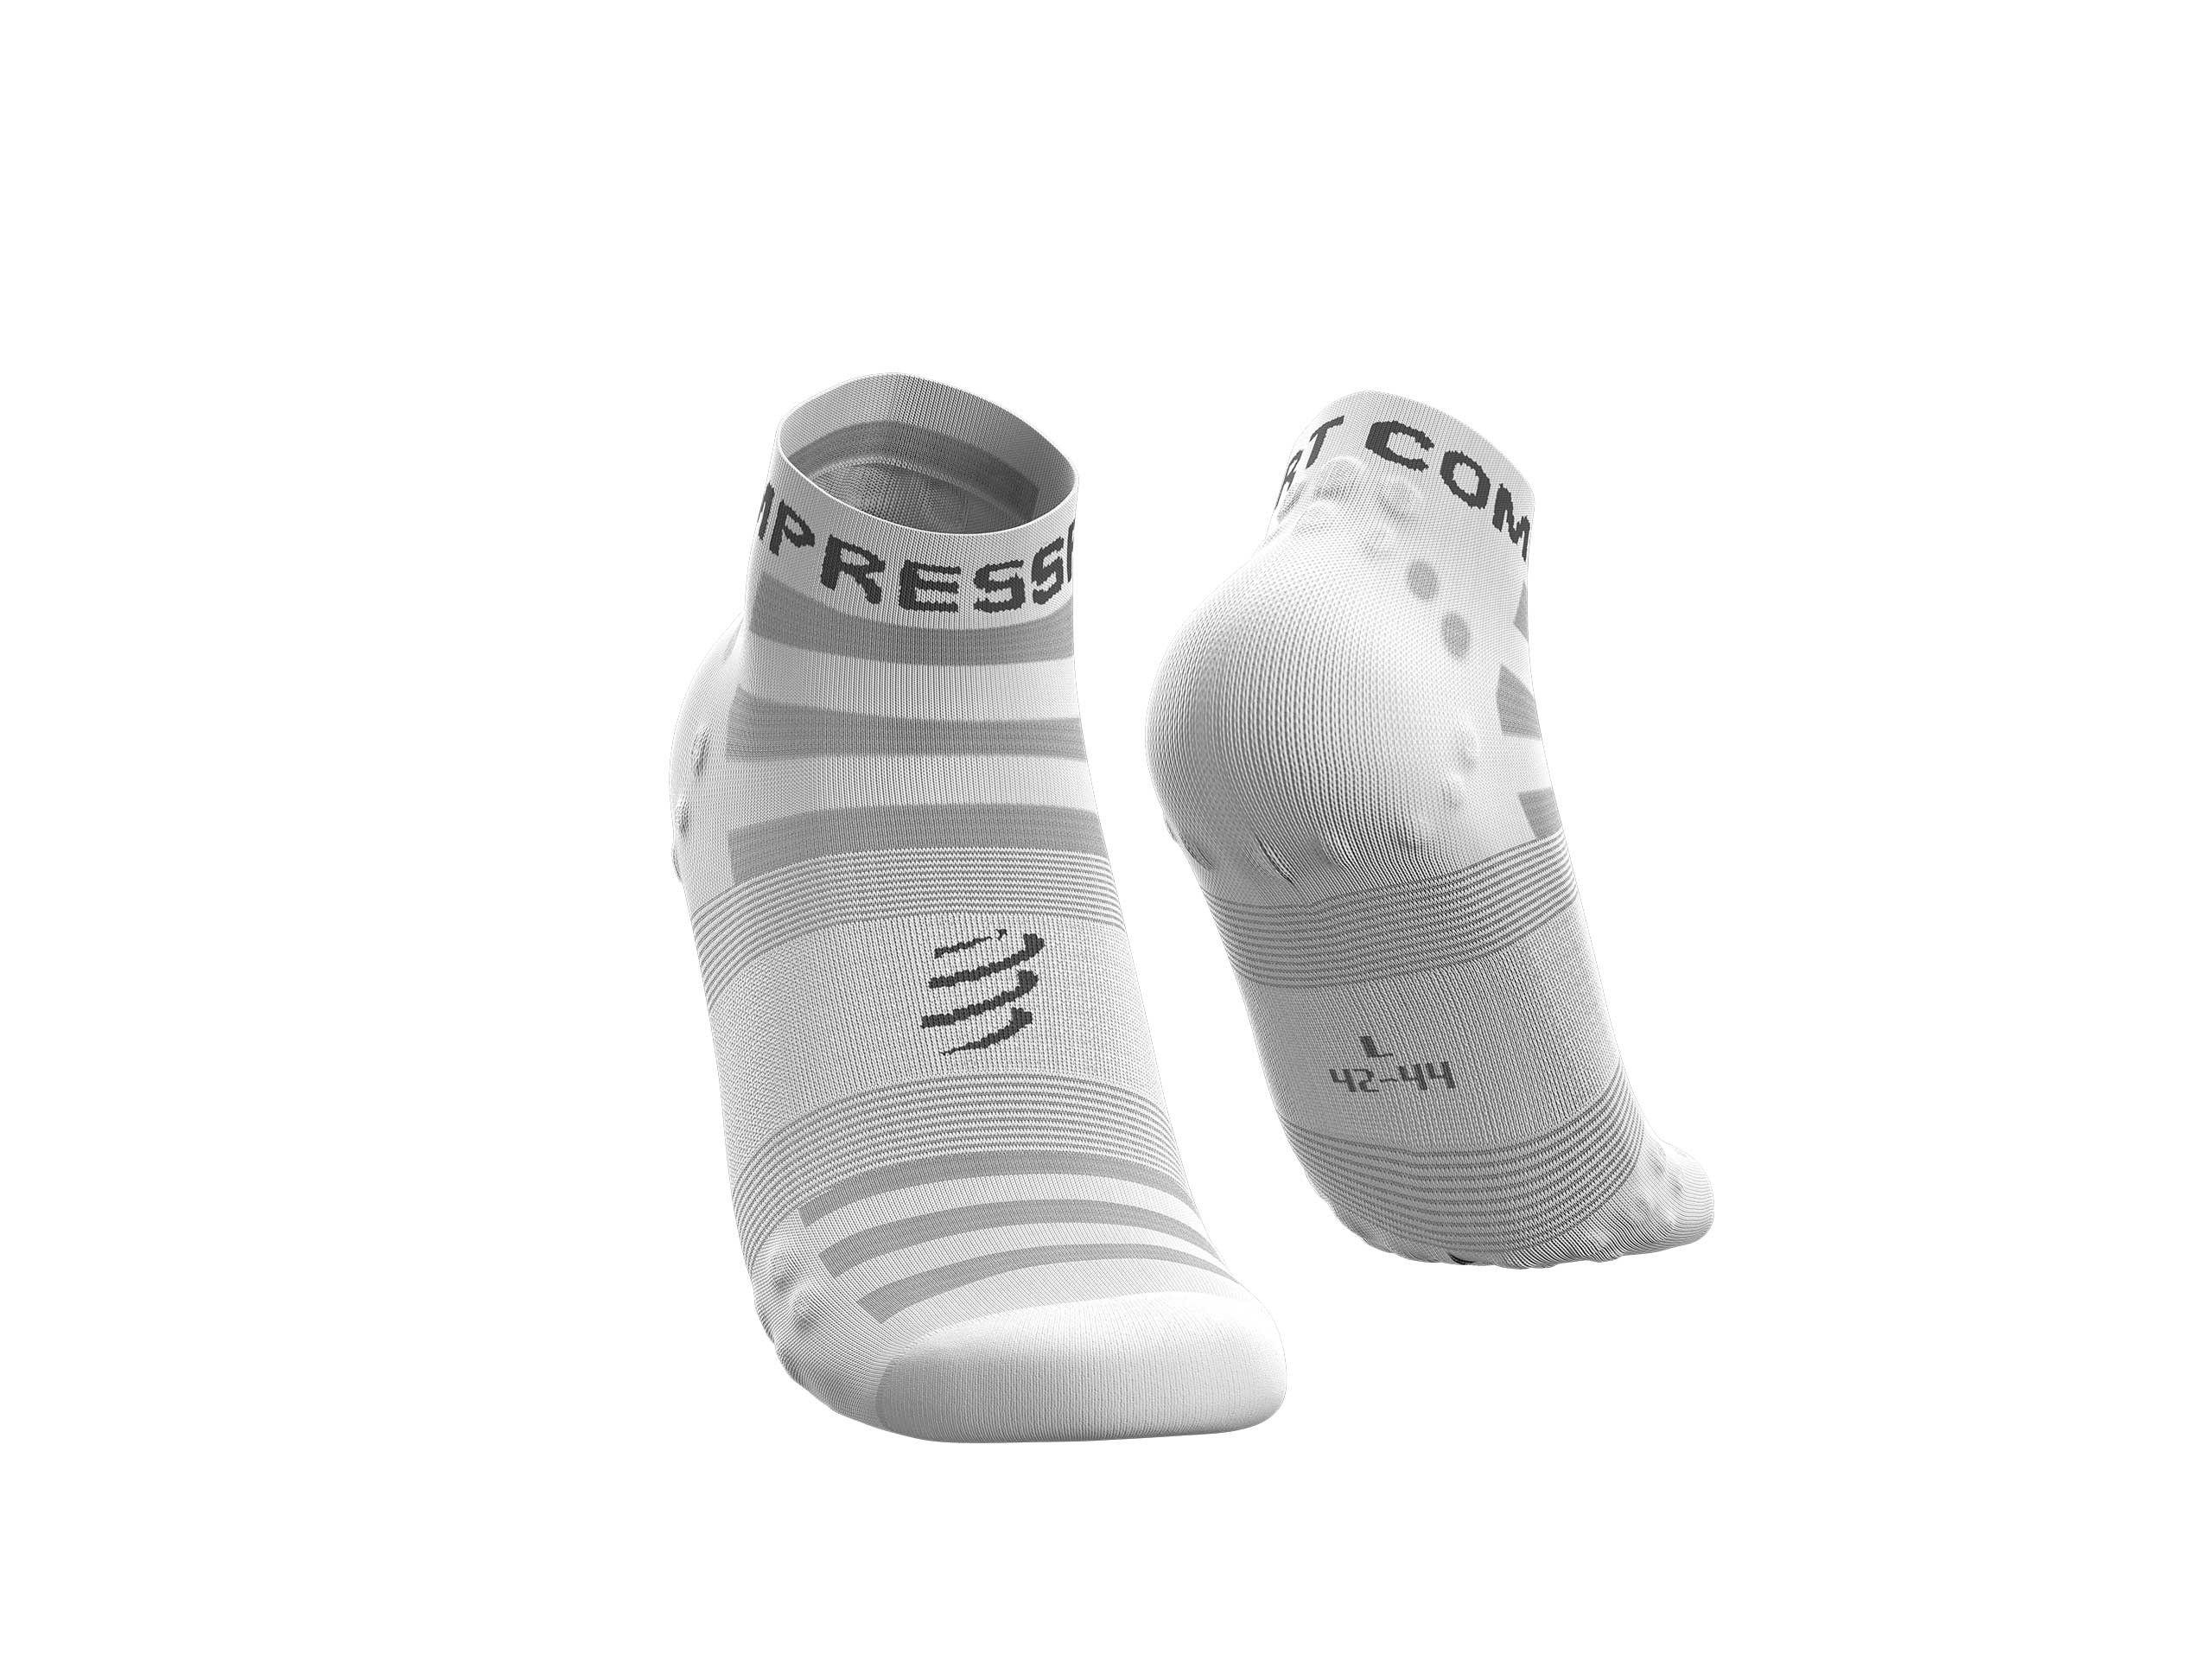 Calcetines Pro Racing v3.0 Ultralight Run Low blancos